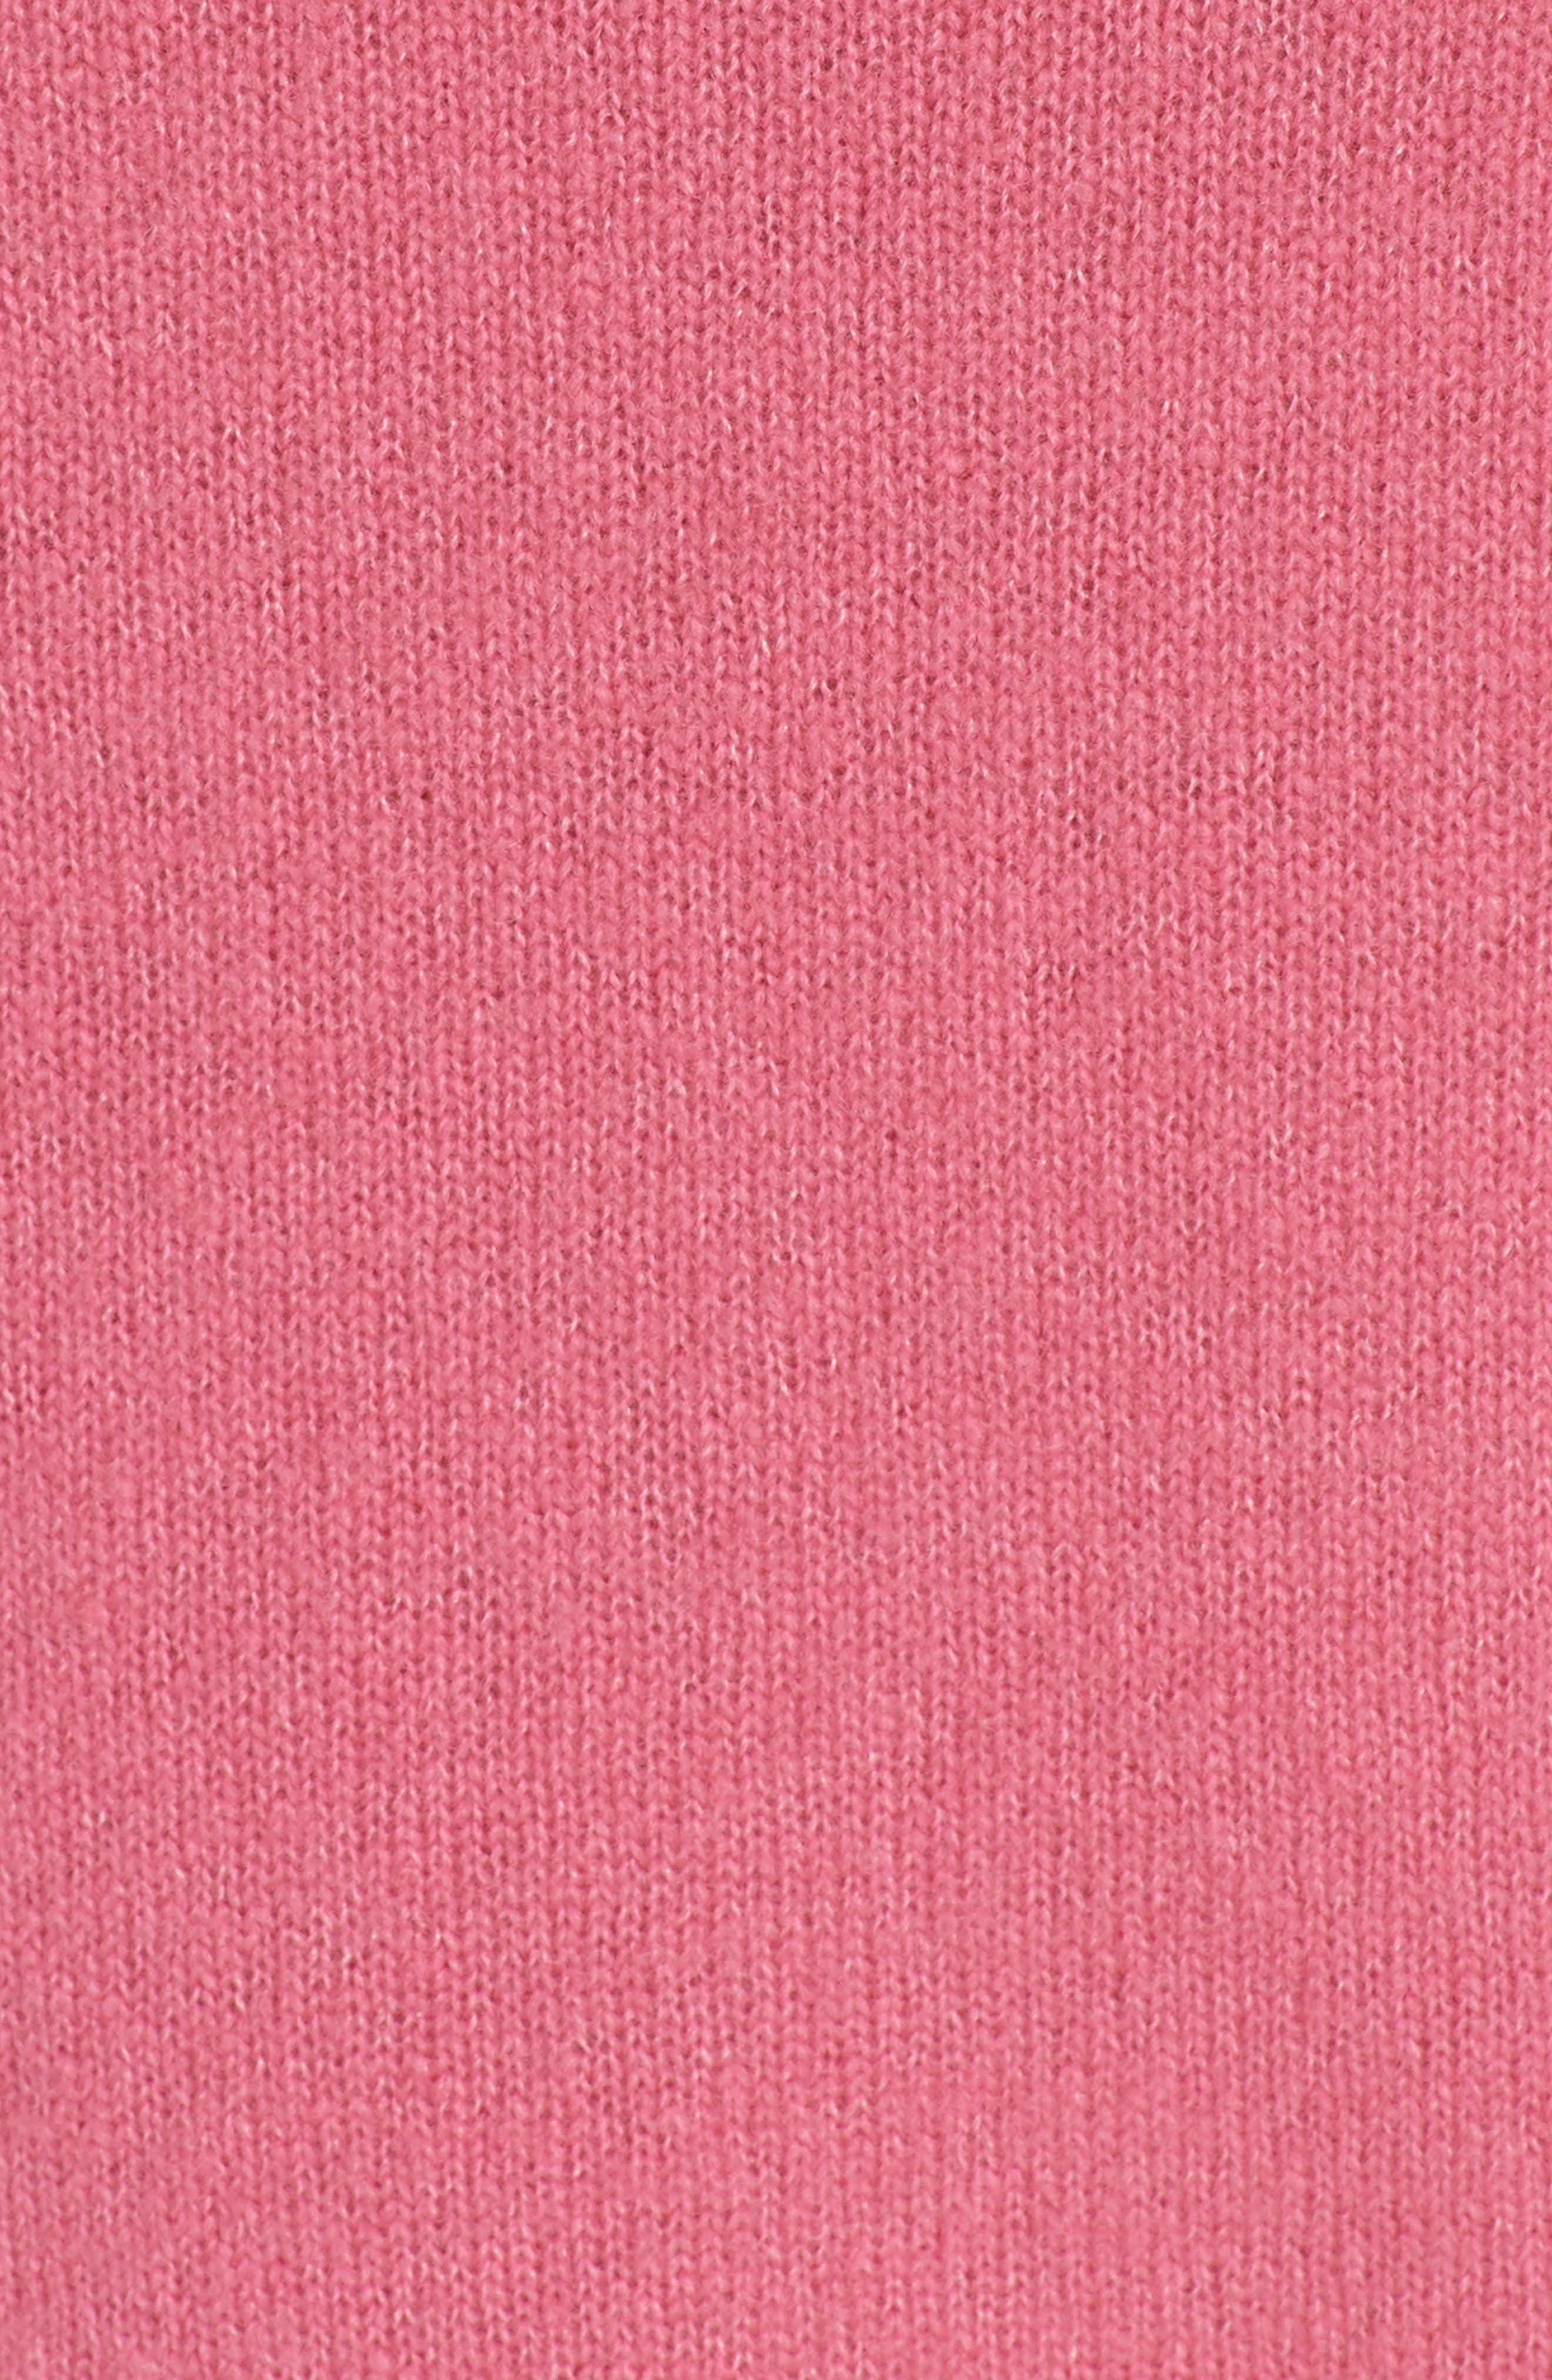 MAX MARA, Stelvio Cashmere & Silk Sweater, Alternate thumbnail 5, color, 672